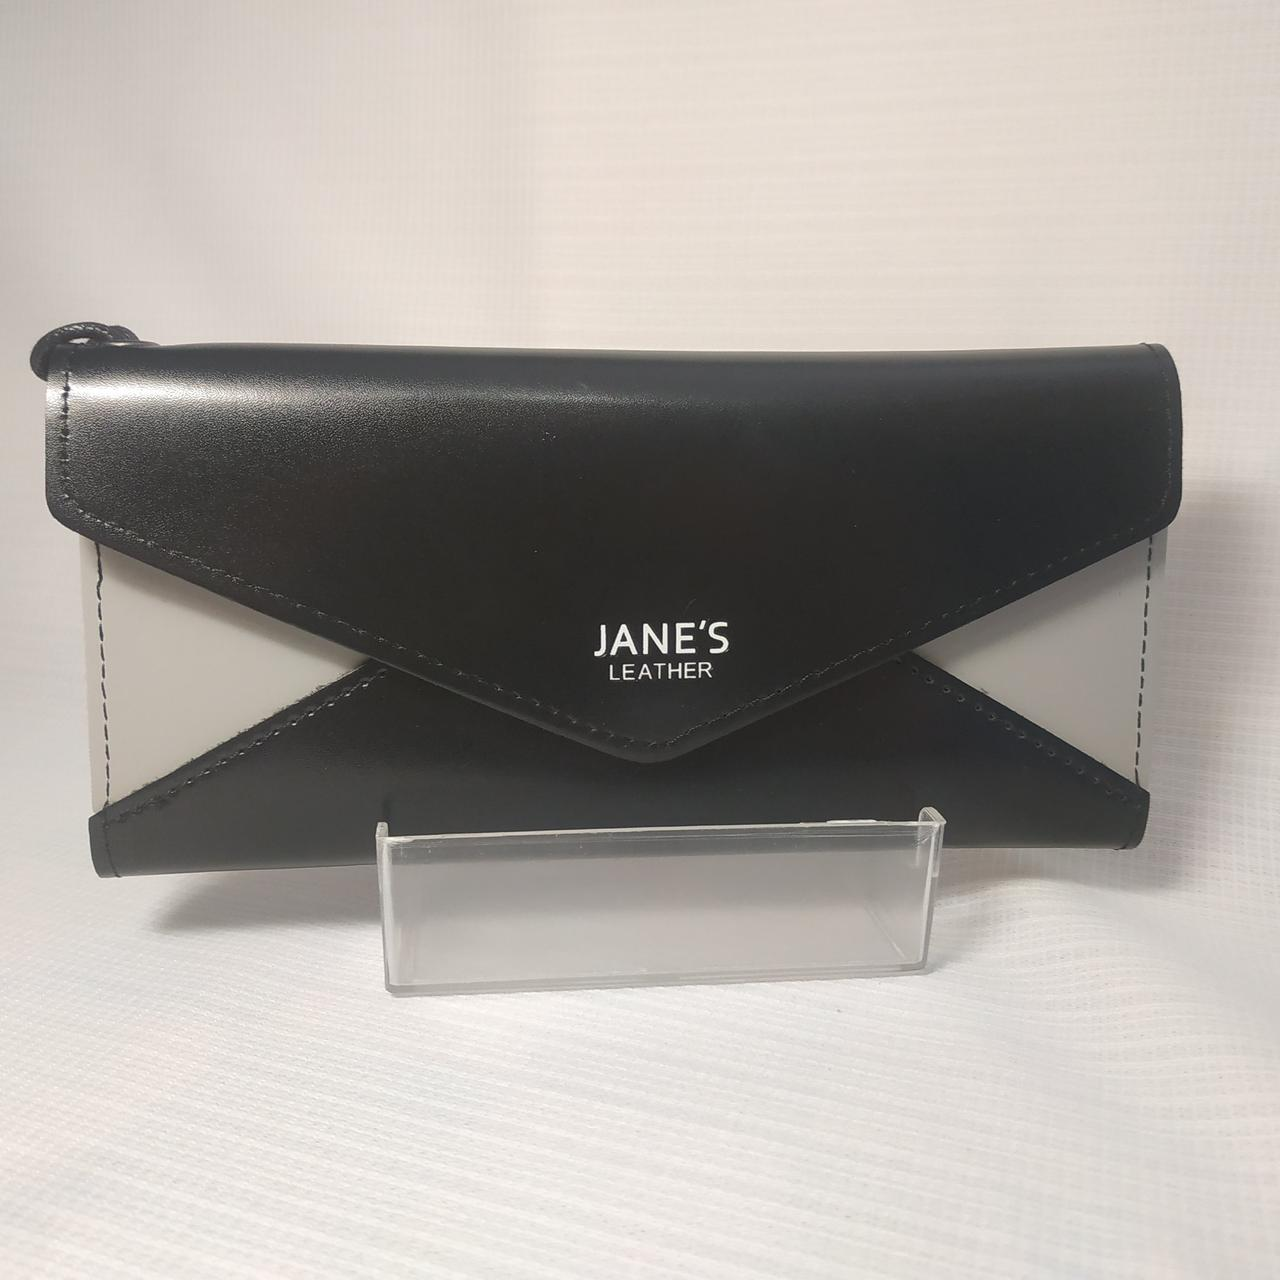 Классический женский кошелек клатч из PU кожи DBL-PU-0001